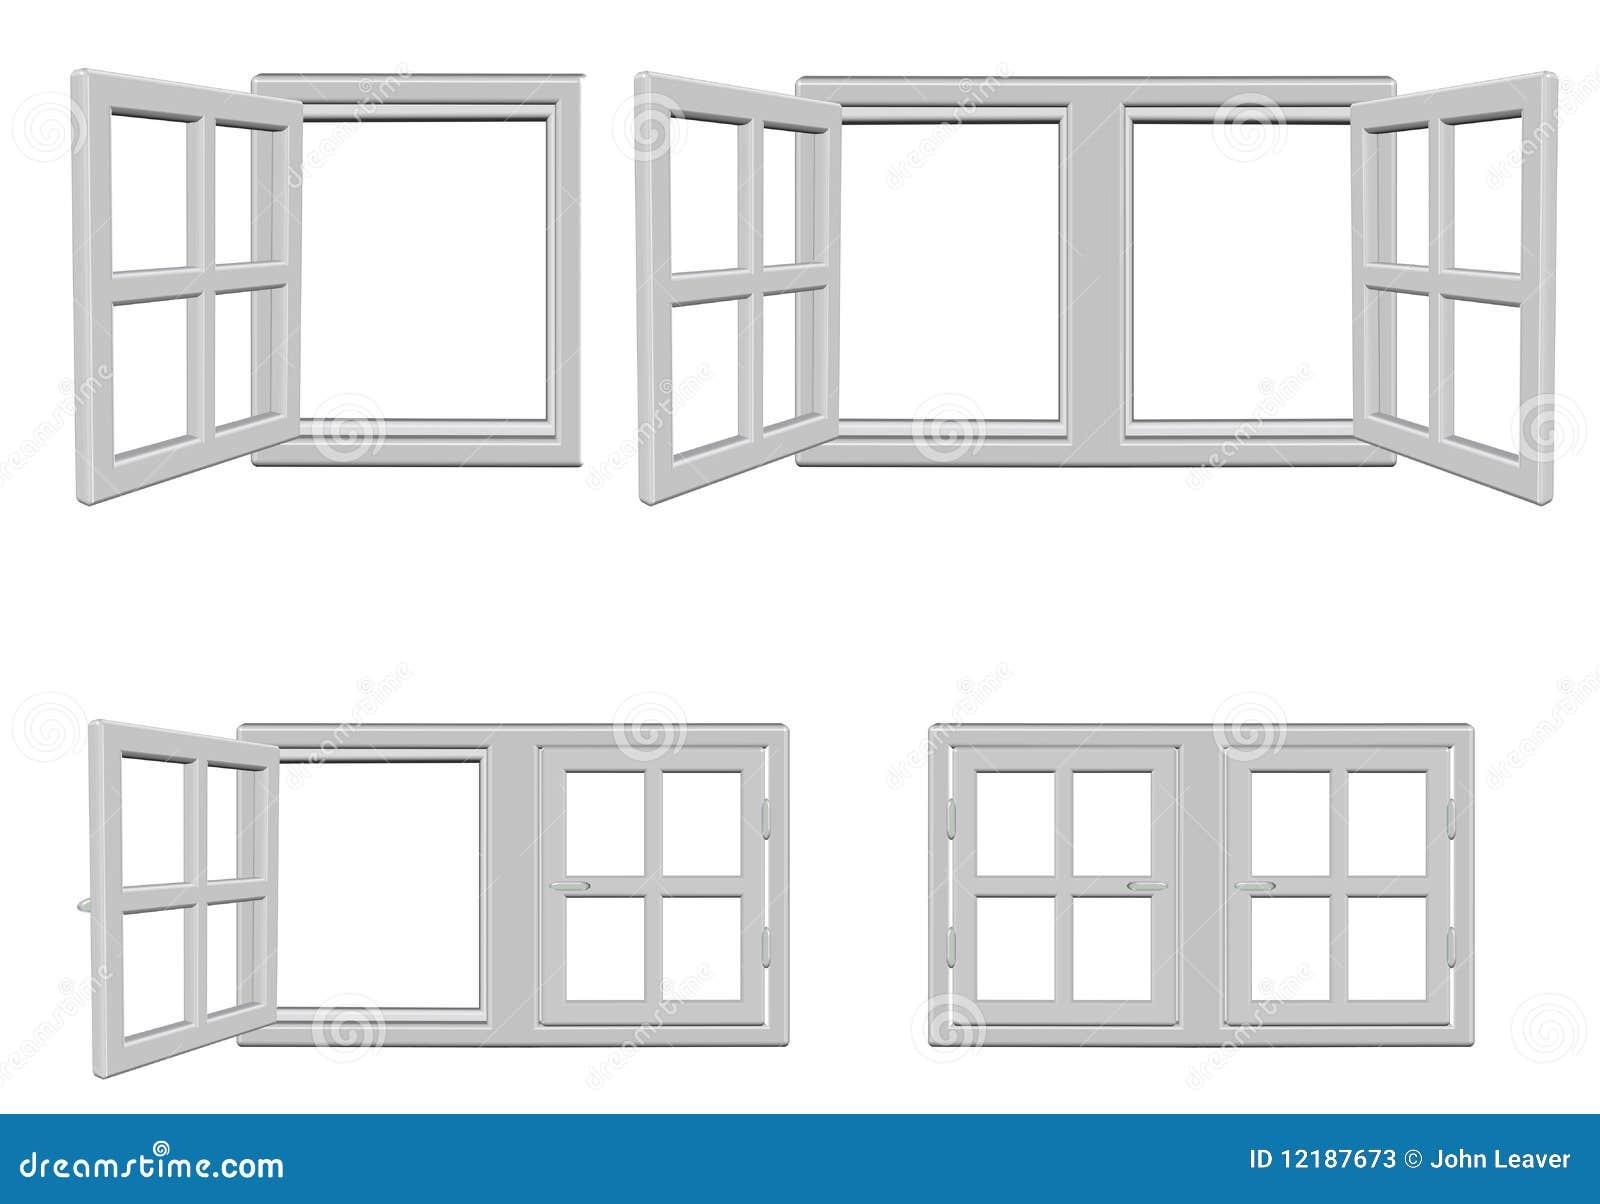 Stock Photos Window Image12187673 on Modern Open Plan House Design